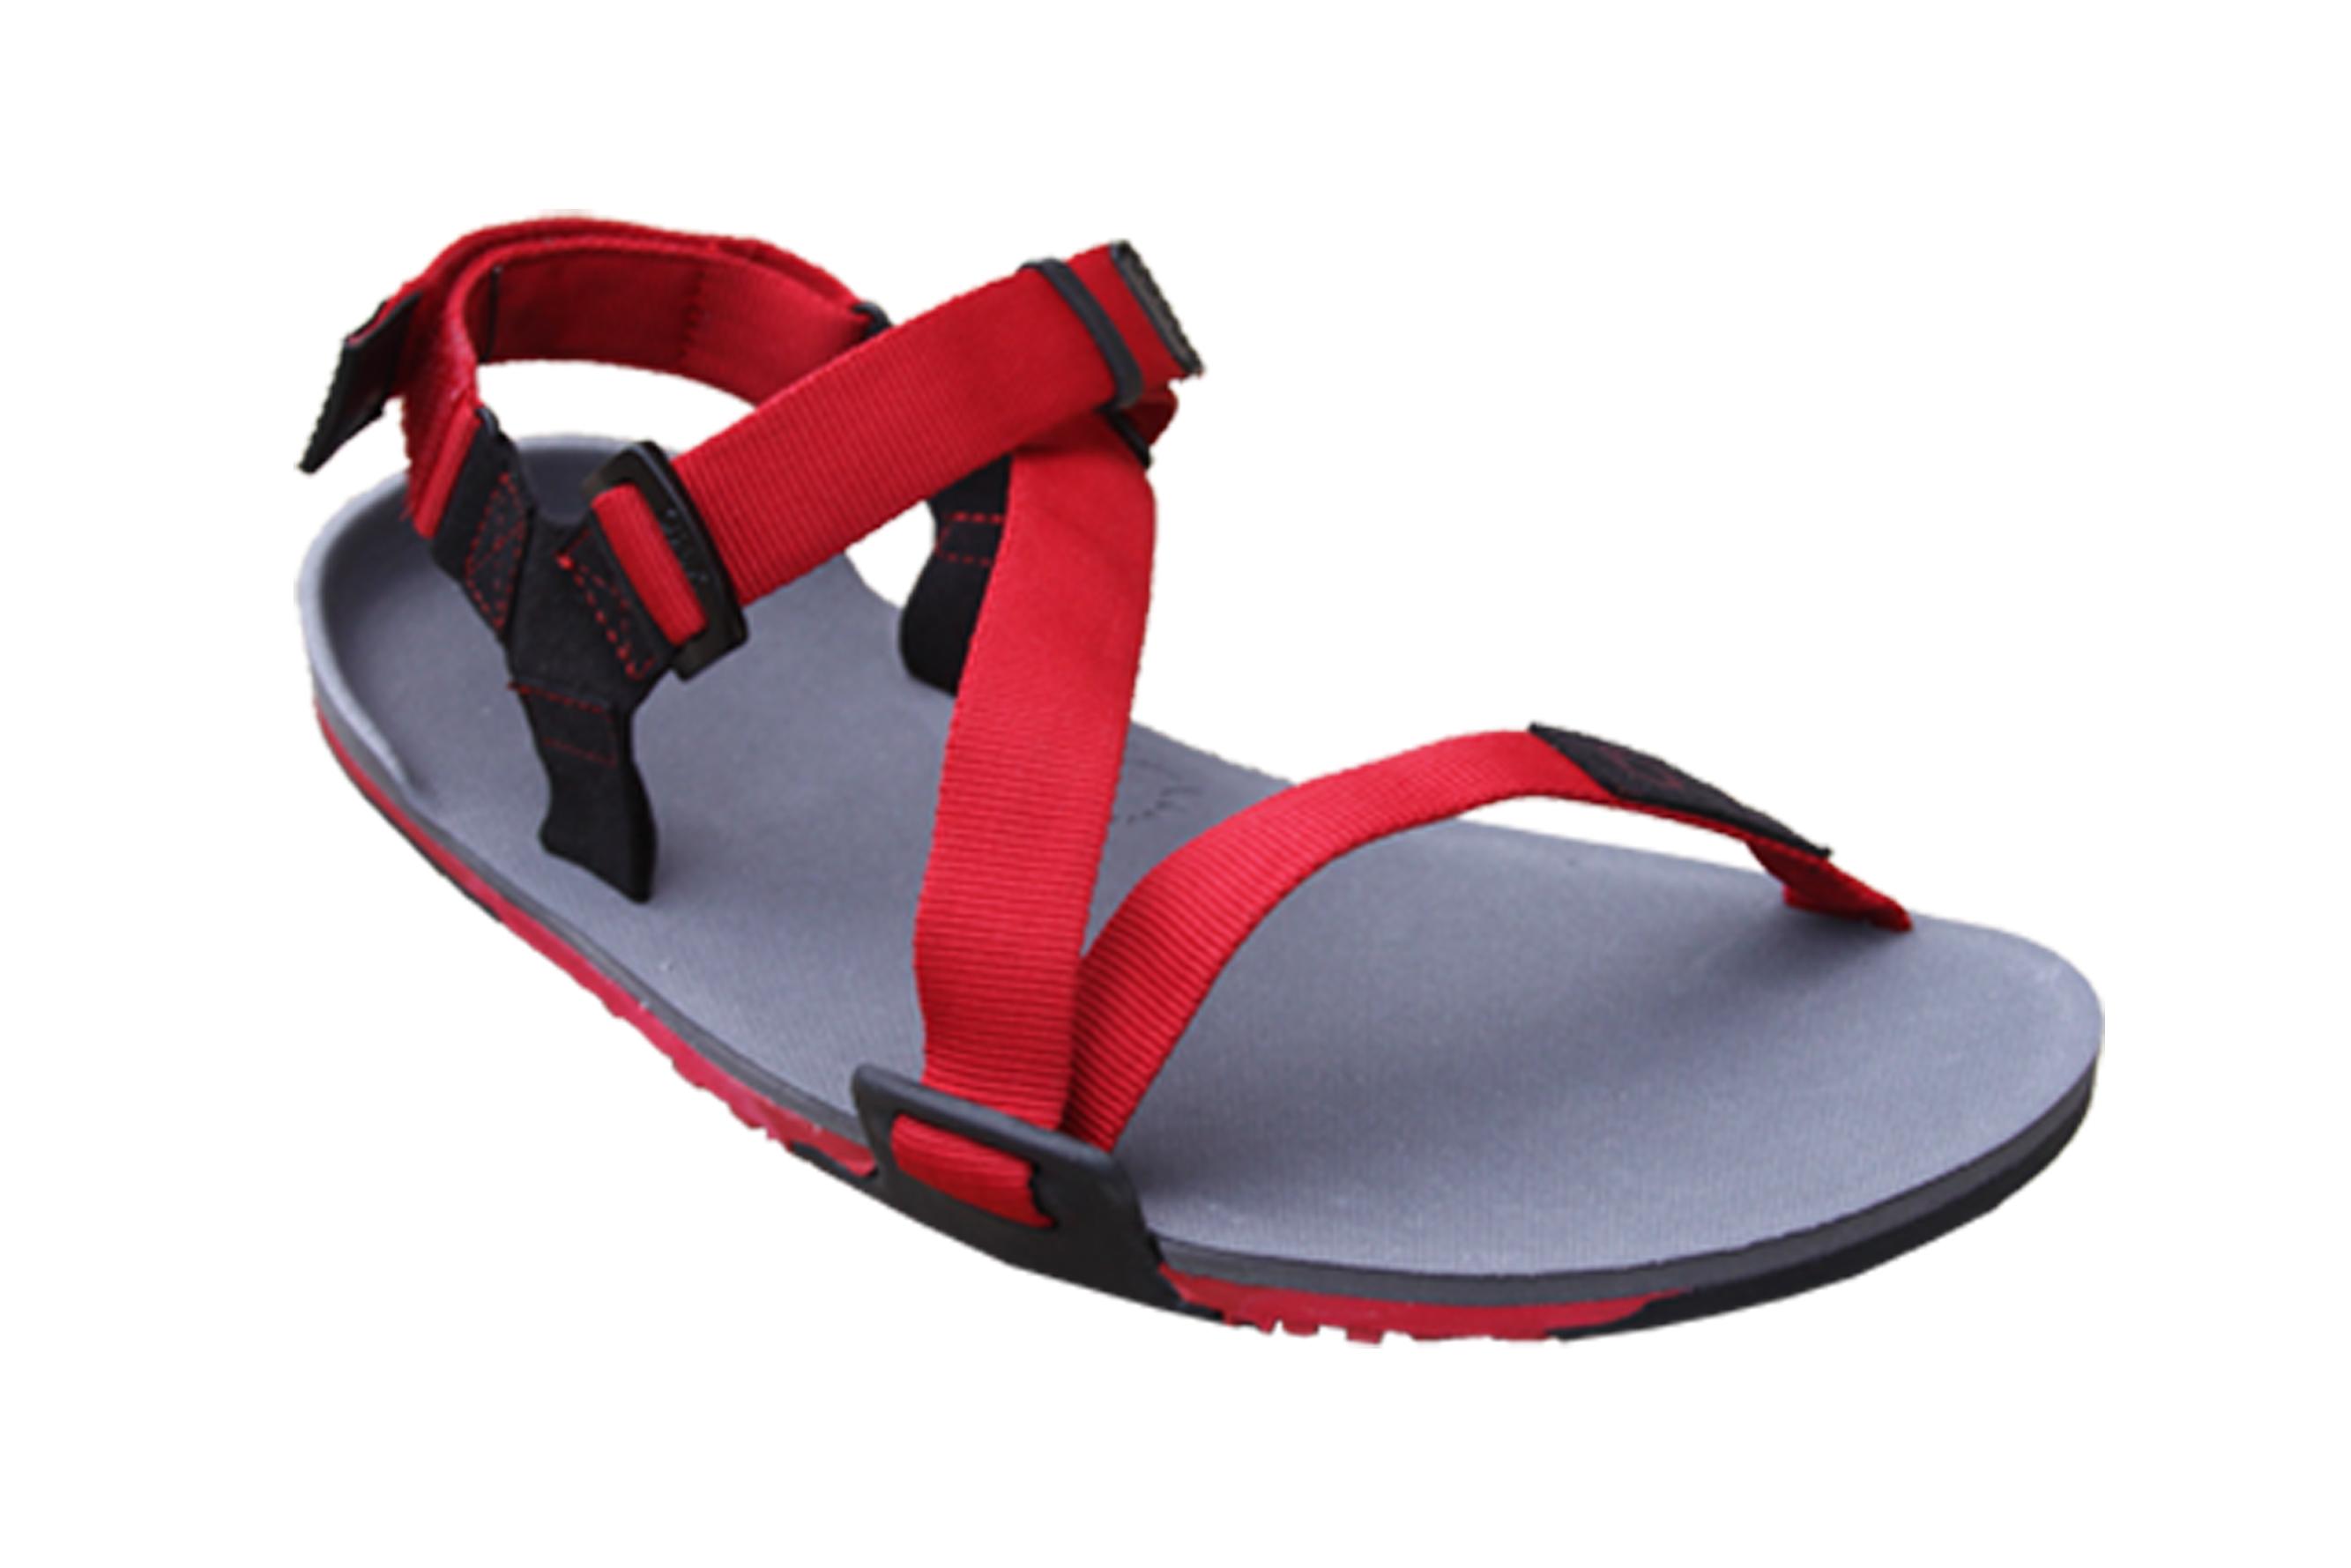 Xero Shoes sandals - as seen on Shark Tank